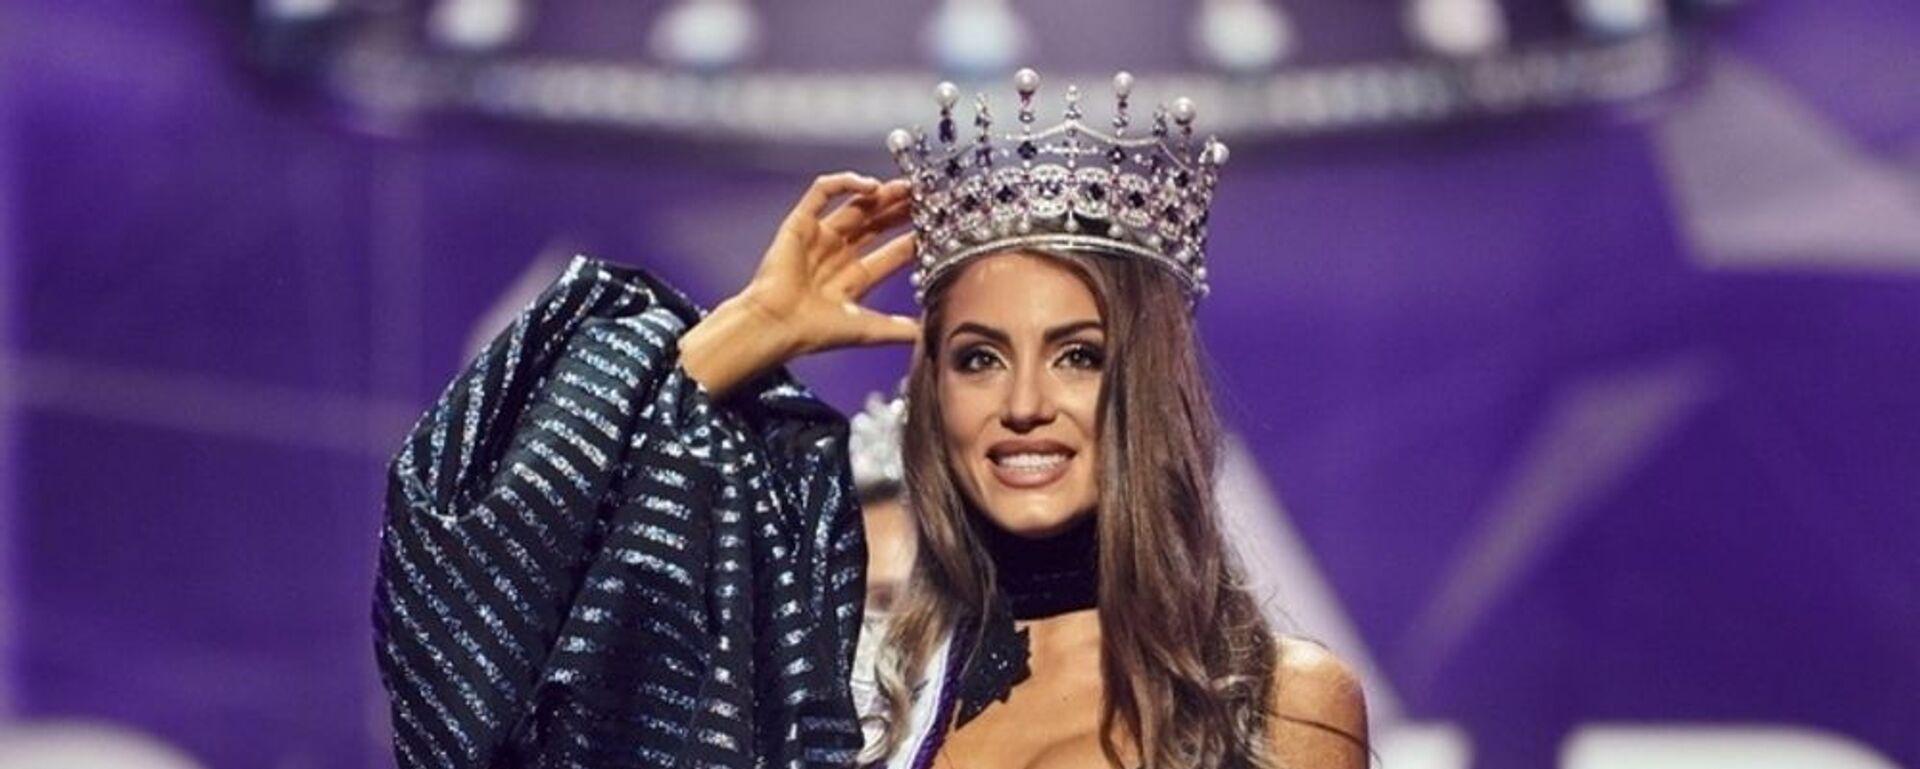 Мисс Украина - 2019 Маргарита Паша - Sputnik Latvija, 1920, 26.10.2019